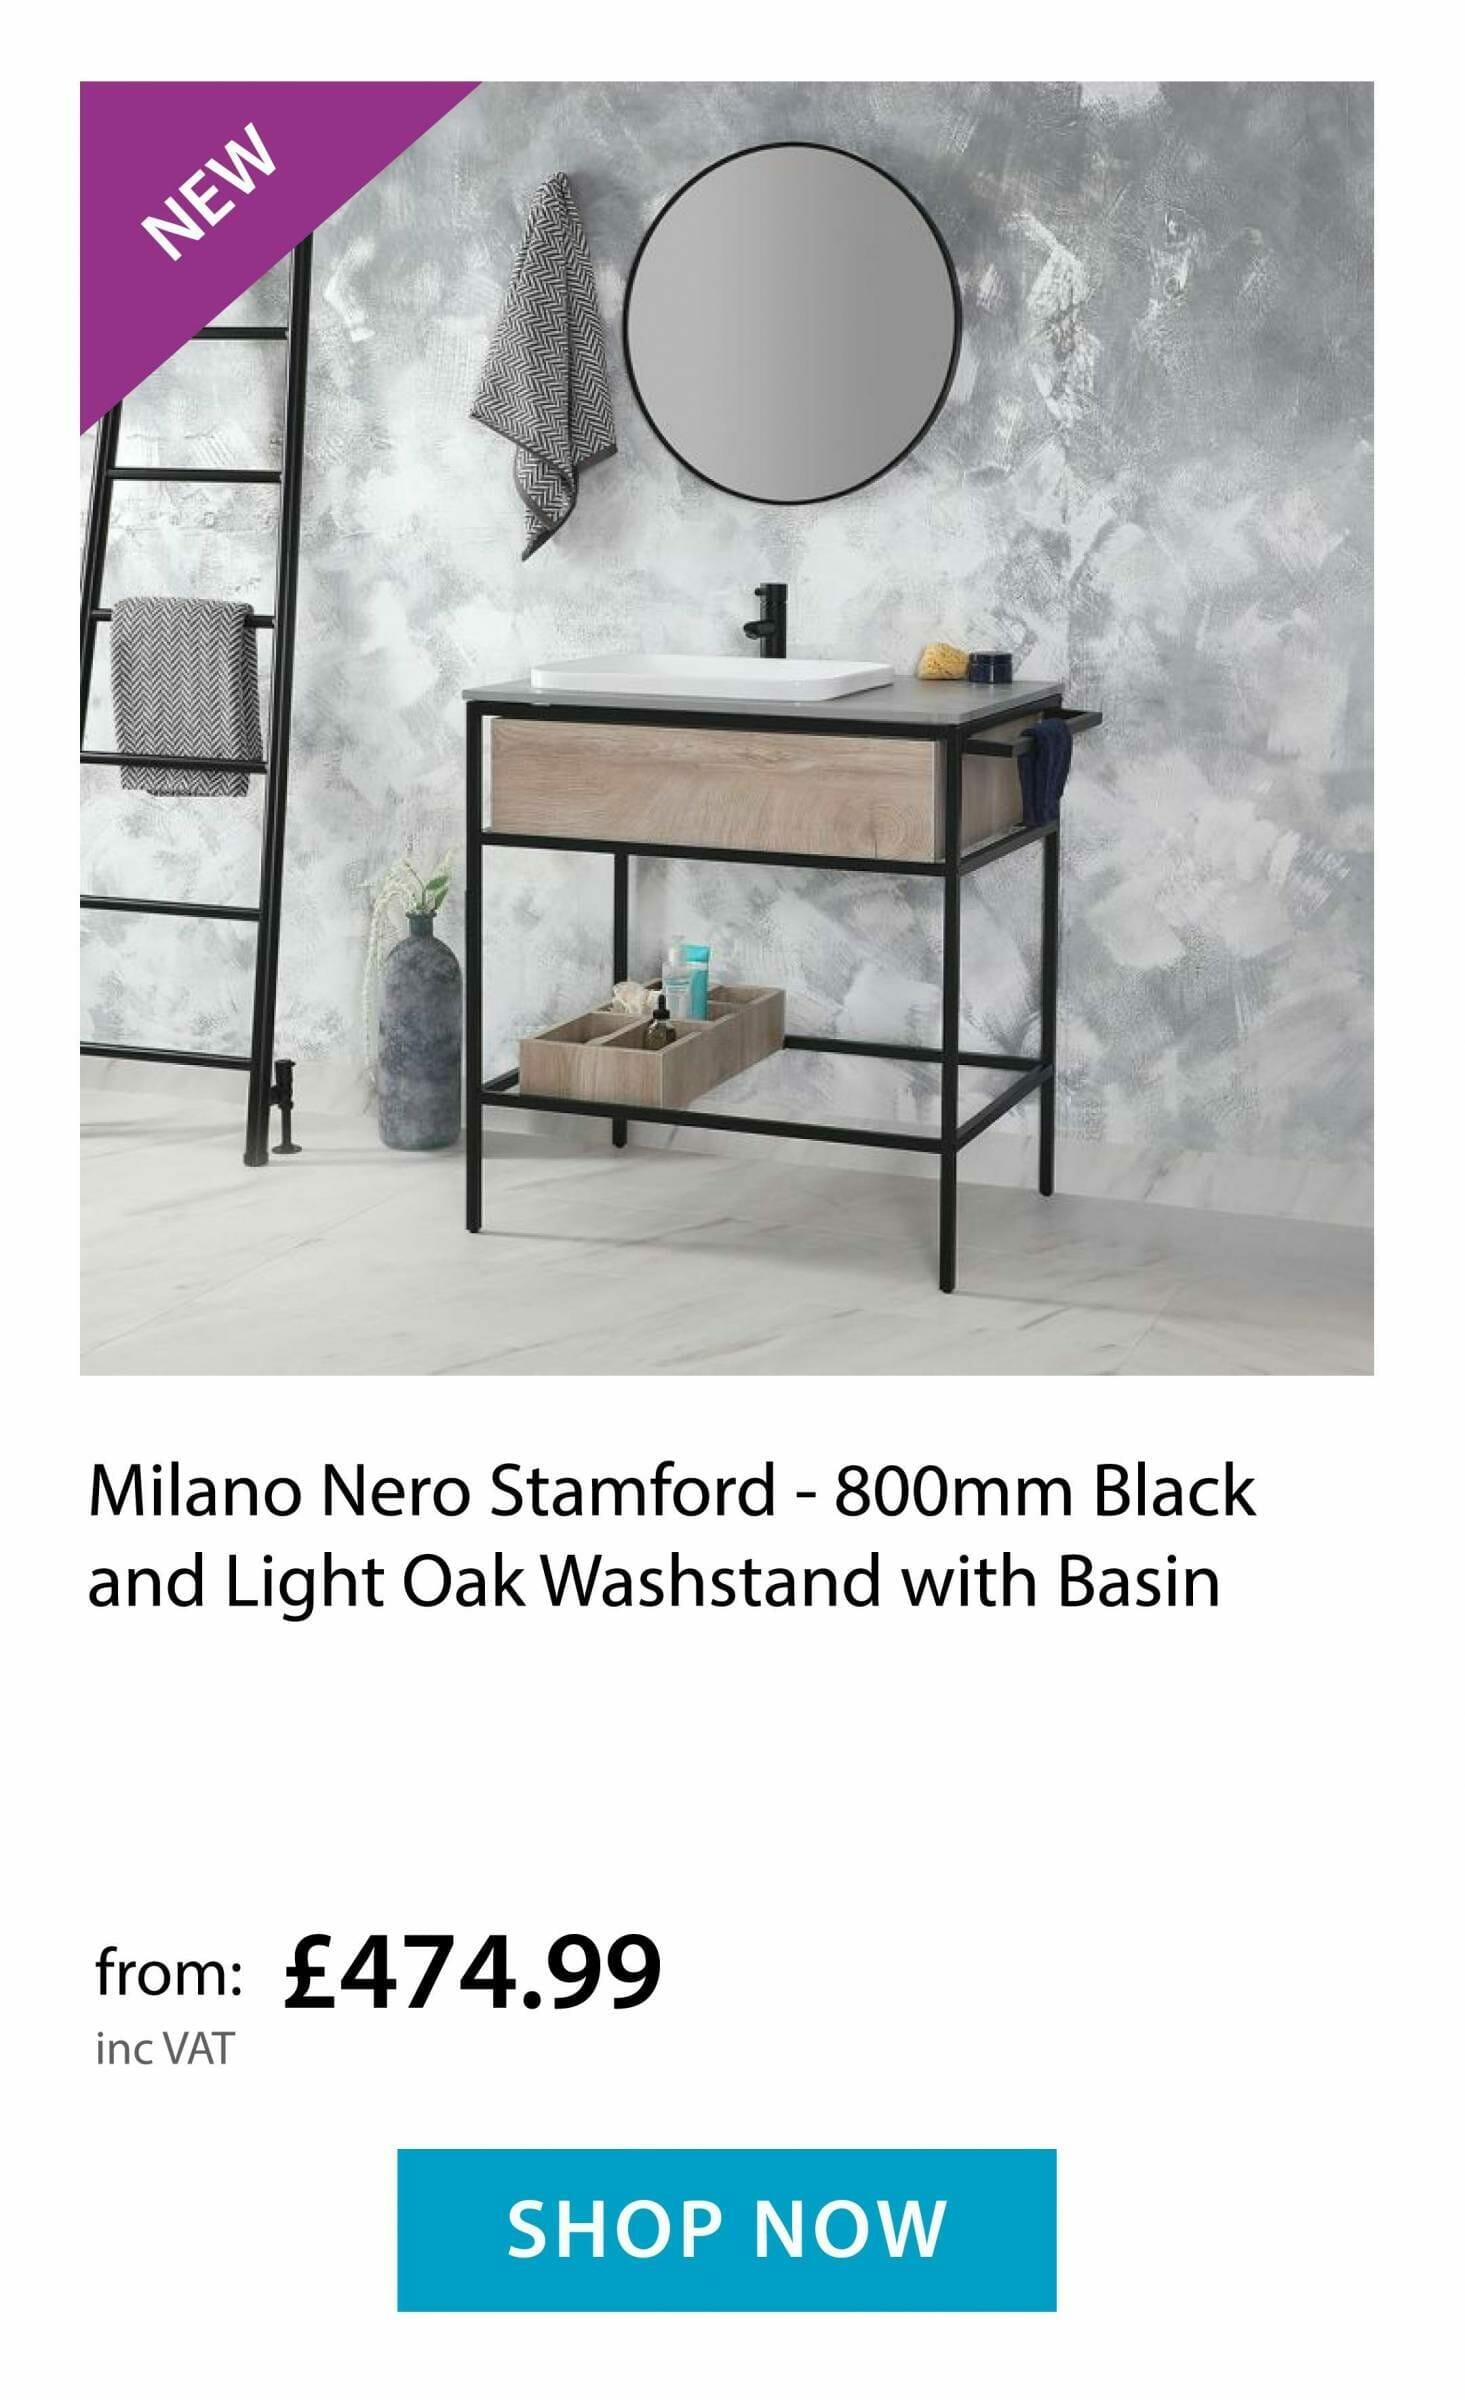 Milano Stamford Washstand and basin